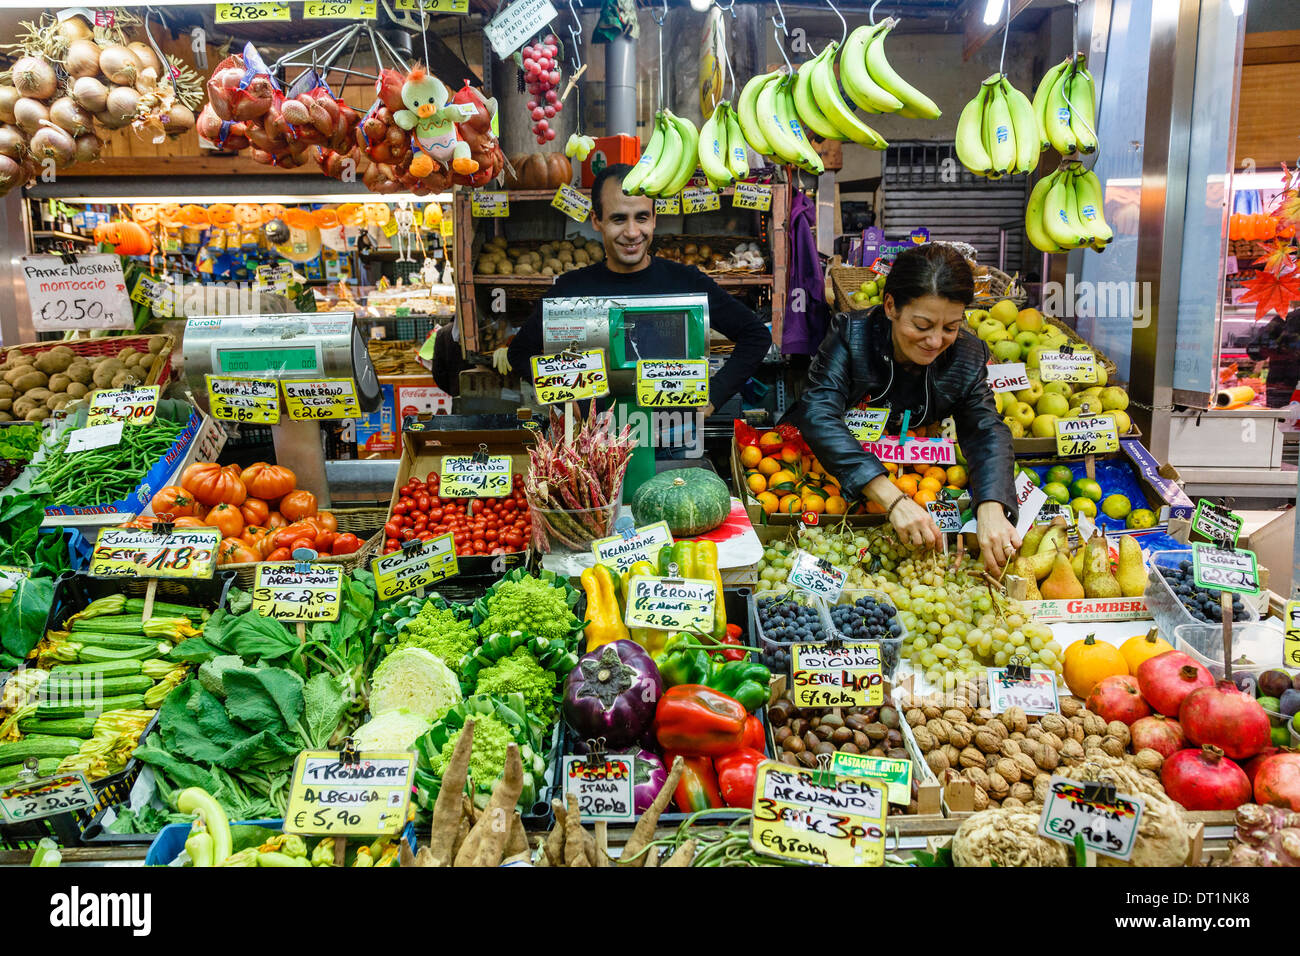 Mercato Orientale (Eastern Market), Genoa, Liguria, Italy, Europe - Stock Image